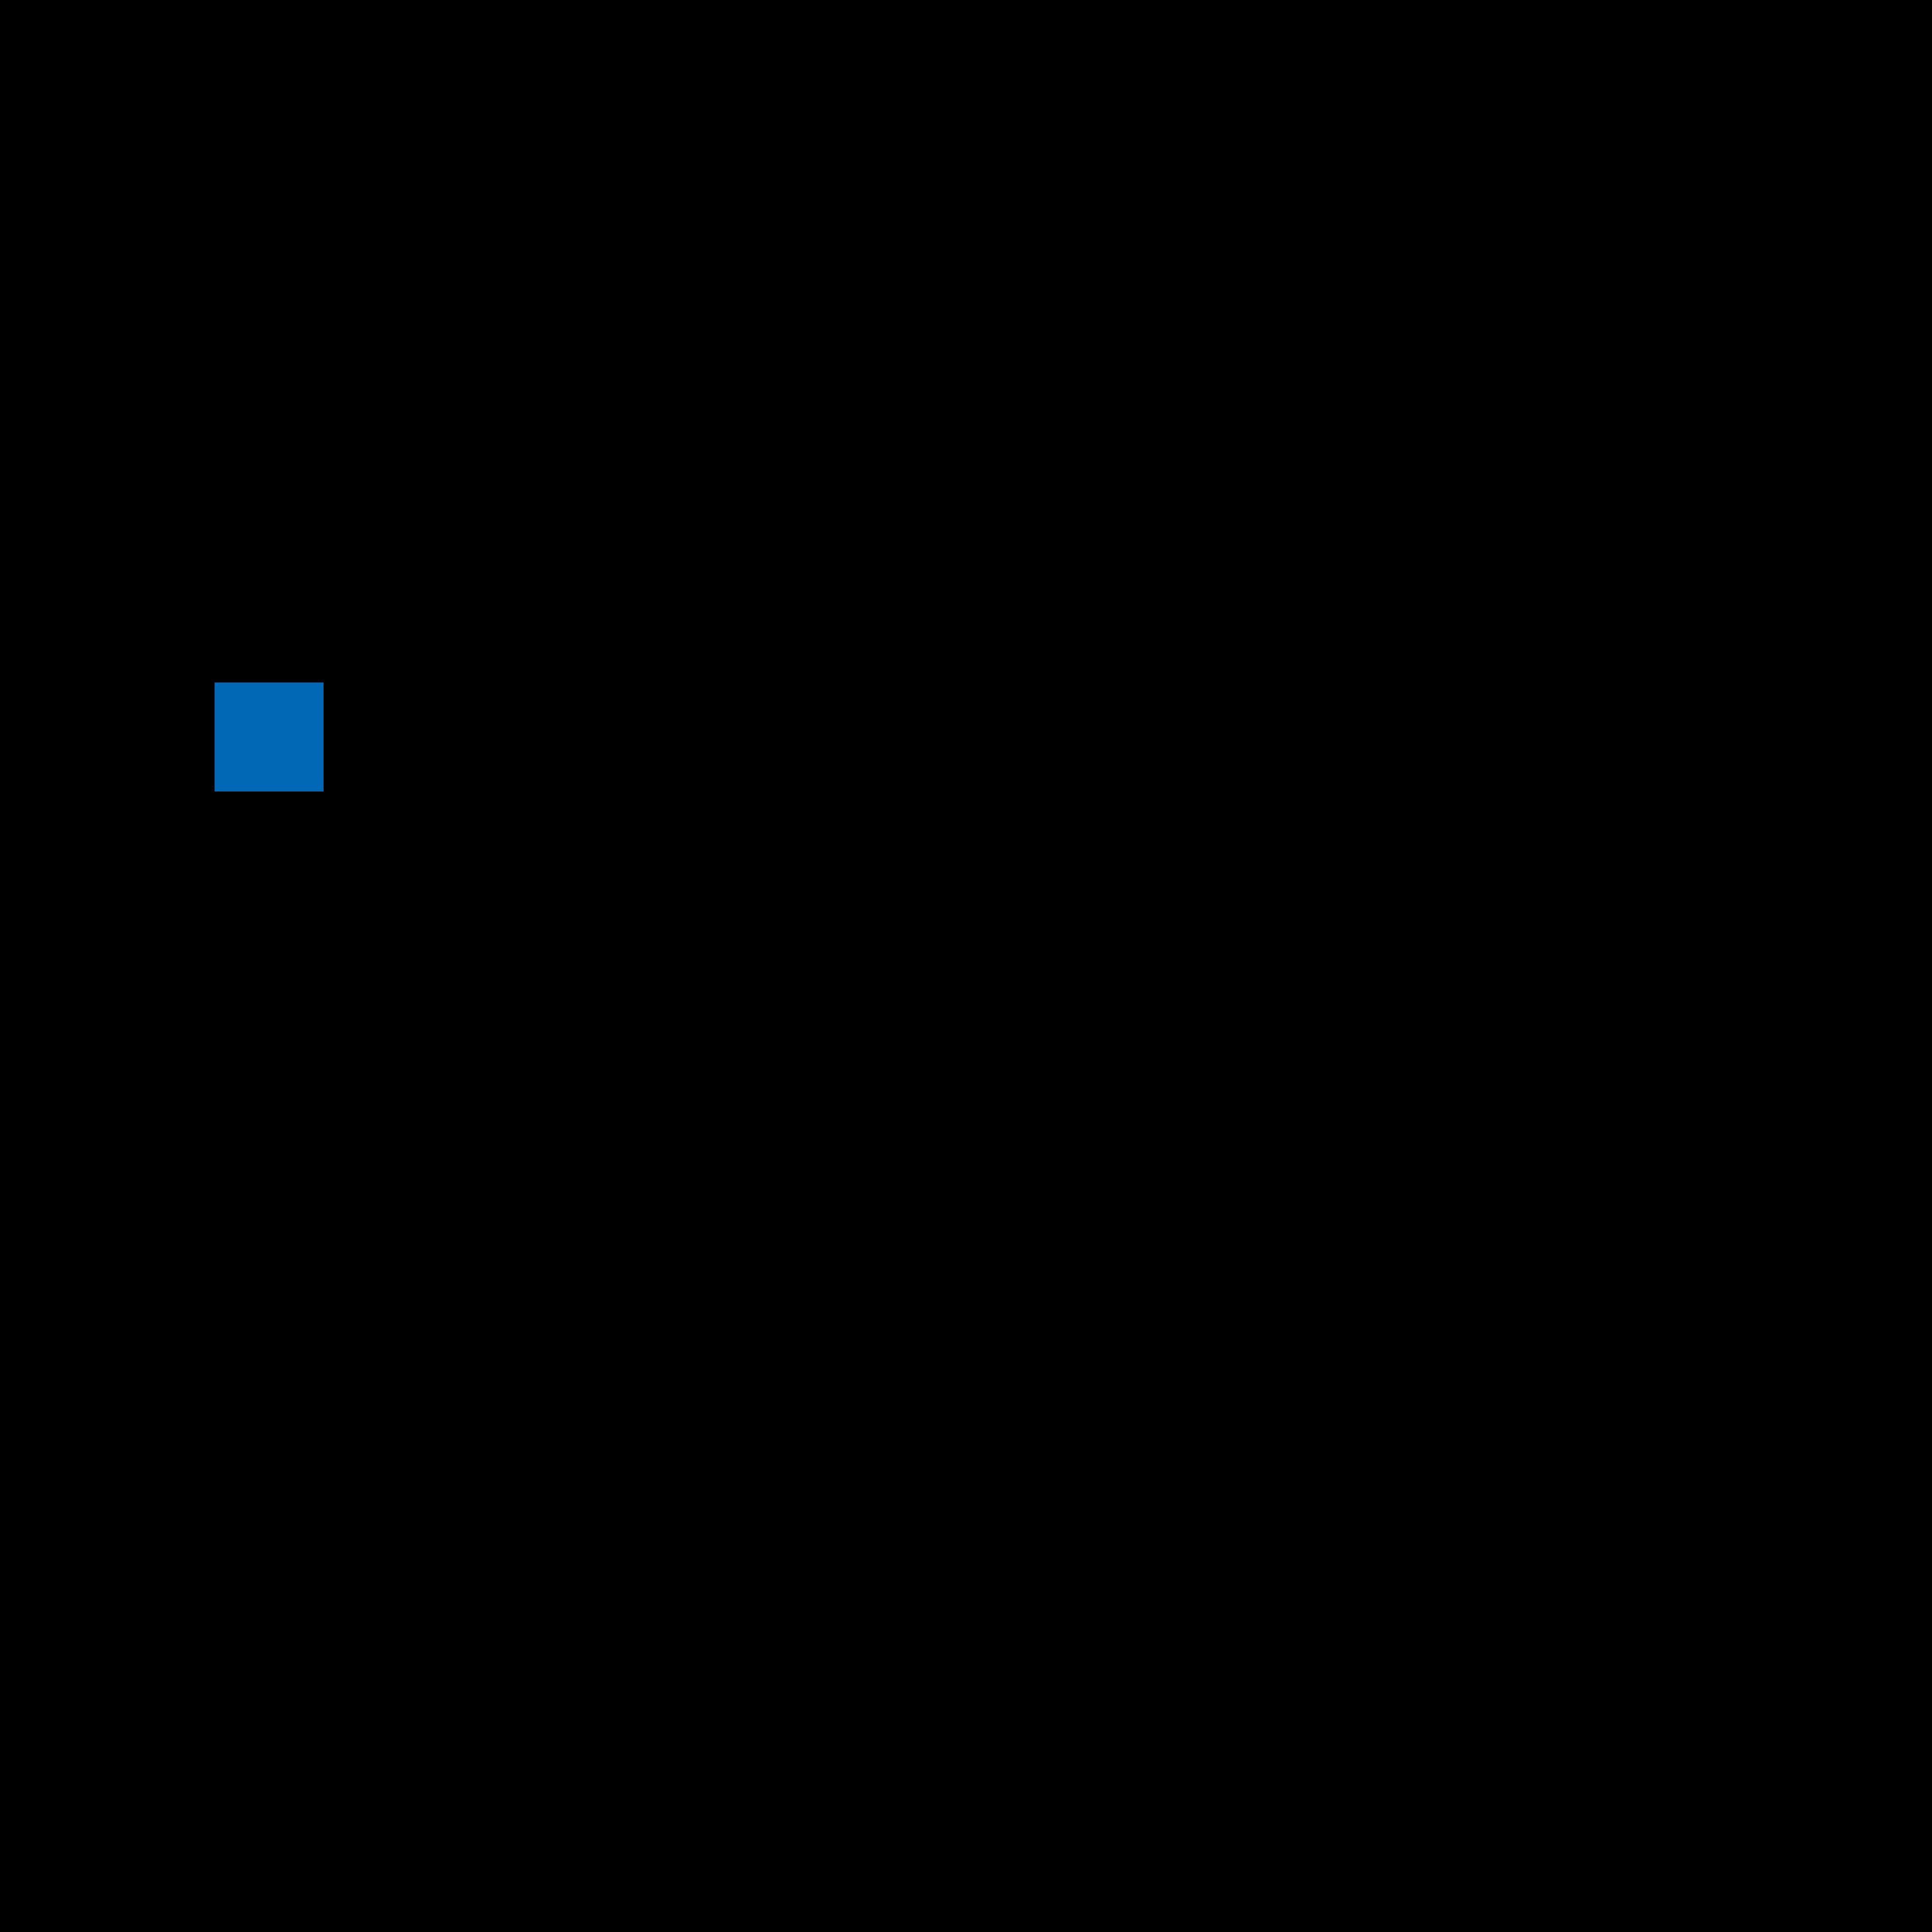 intel logo 0 - Intel Logo